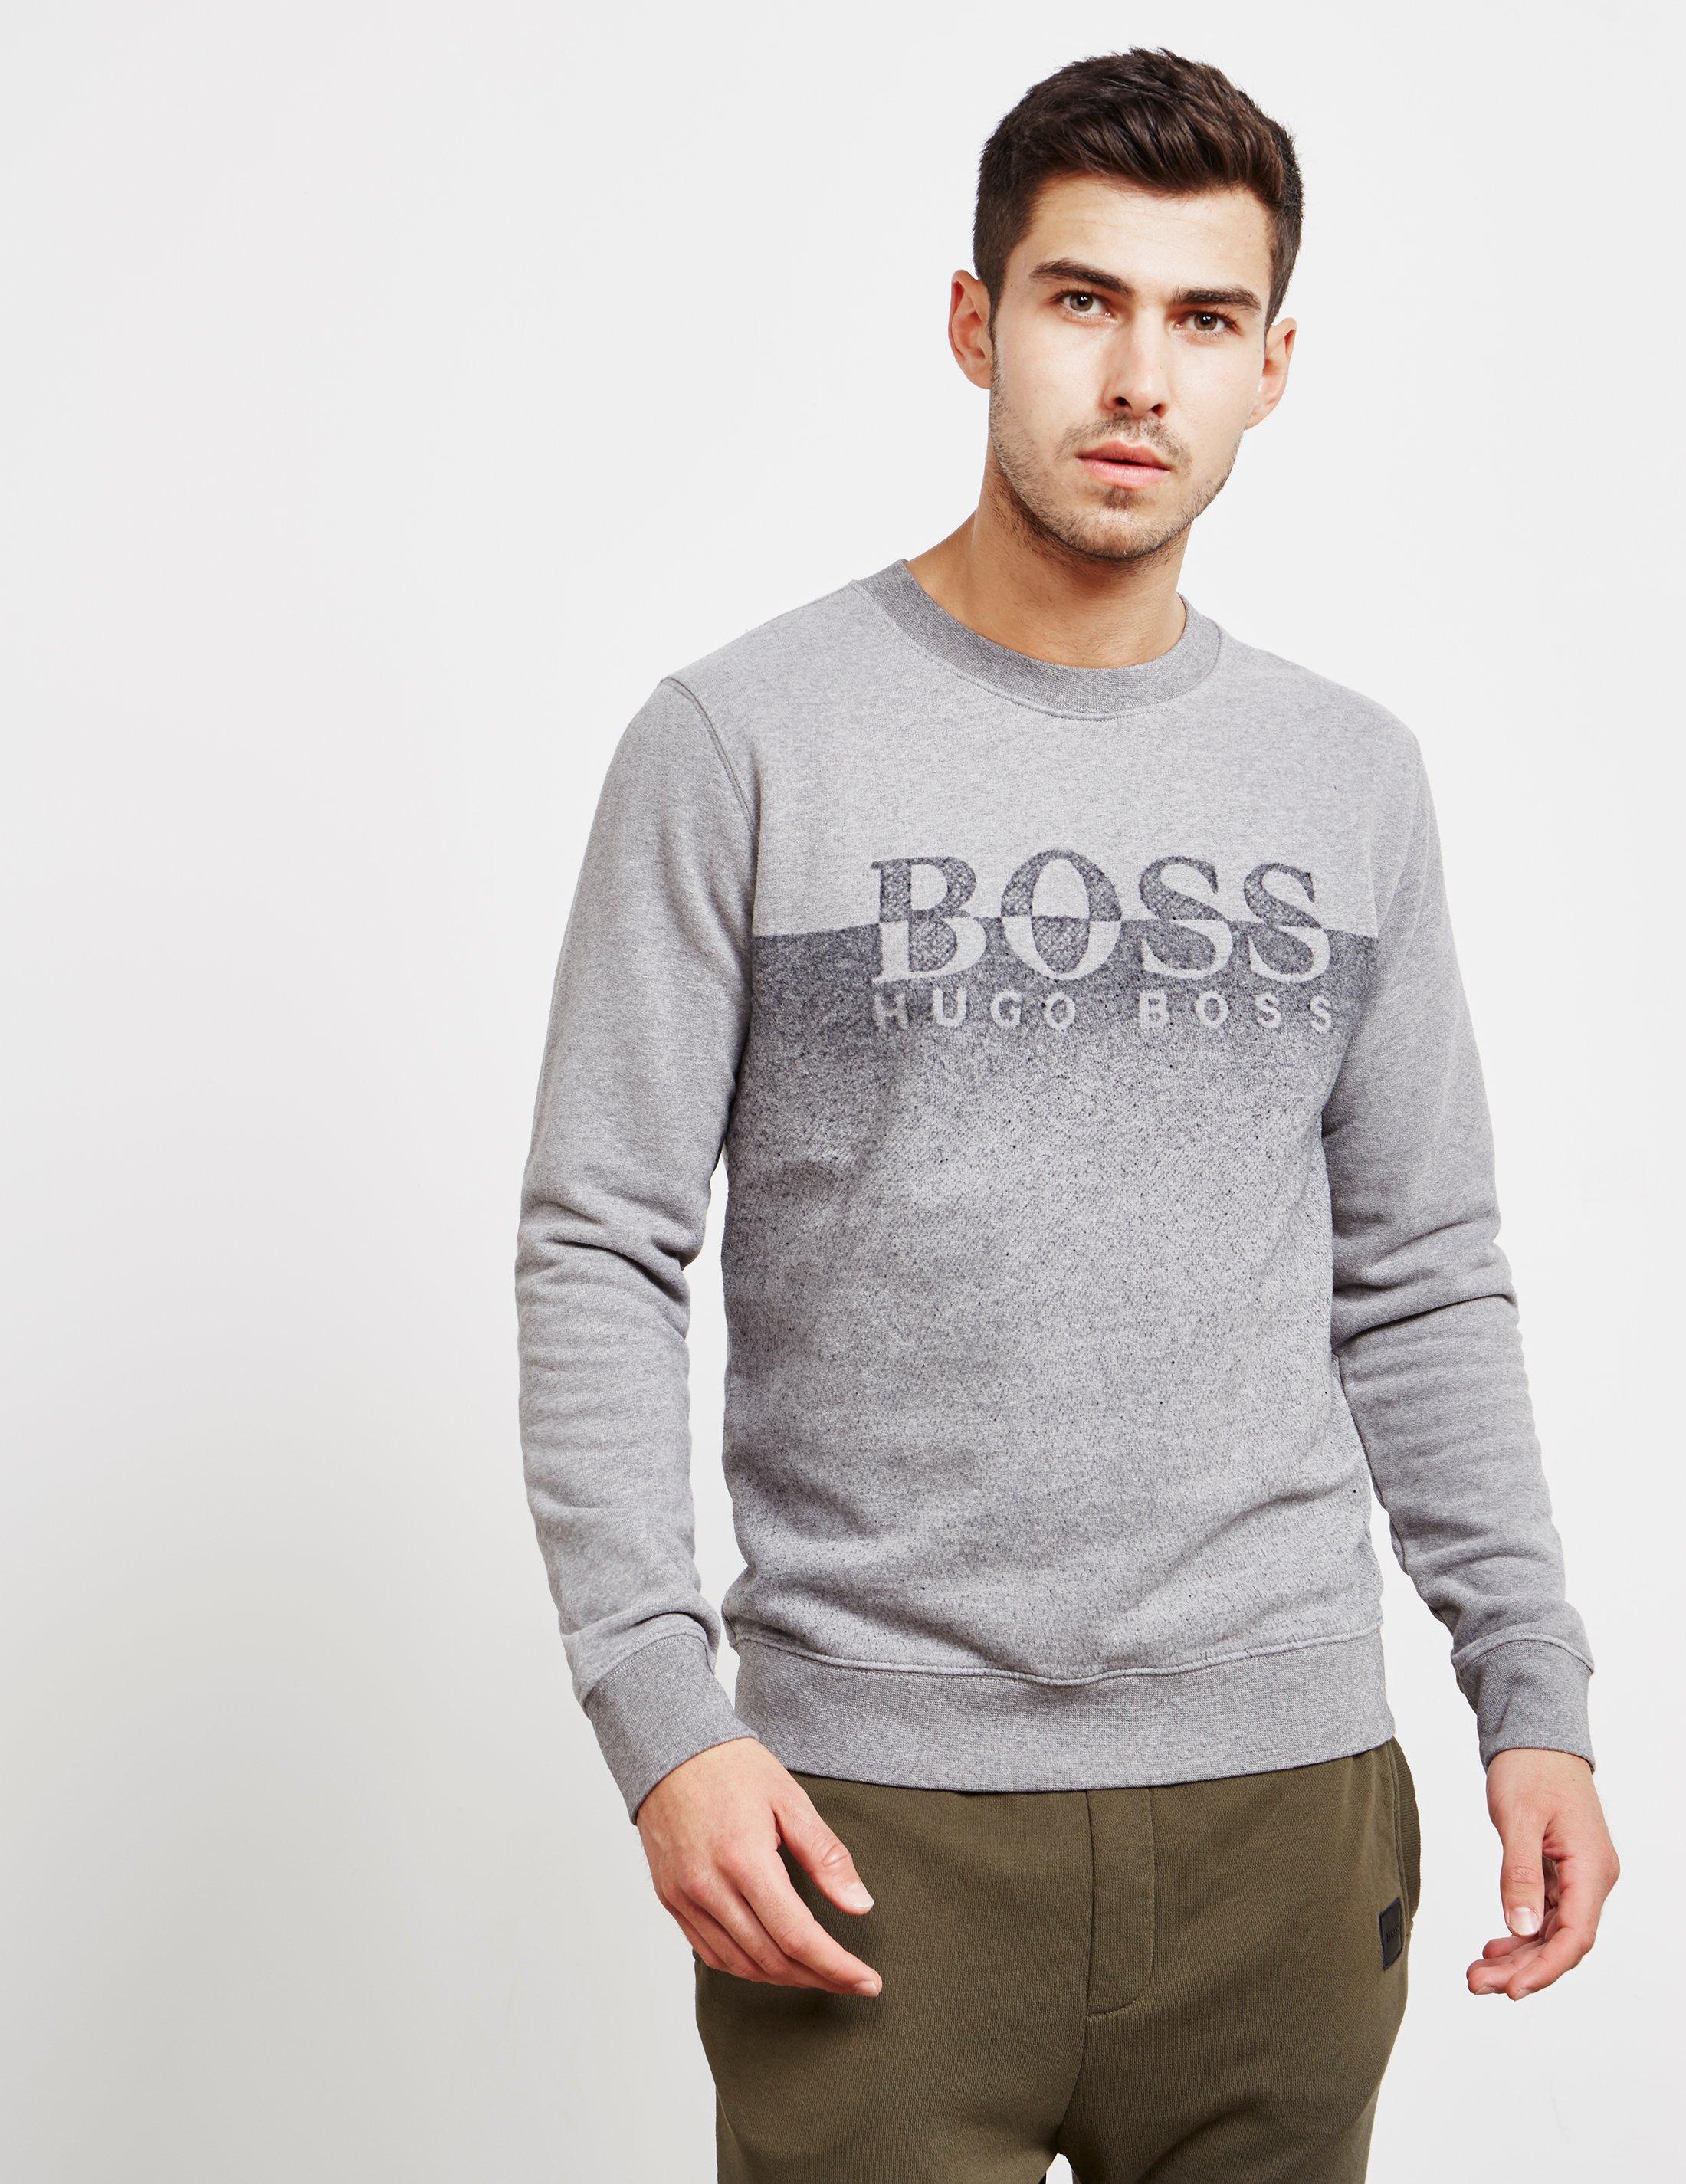 9a4e0c49e Boss Mens Withmore Split Sweatshirt Grey in Gray for Men - Lyst